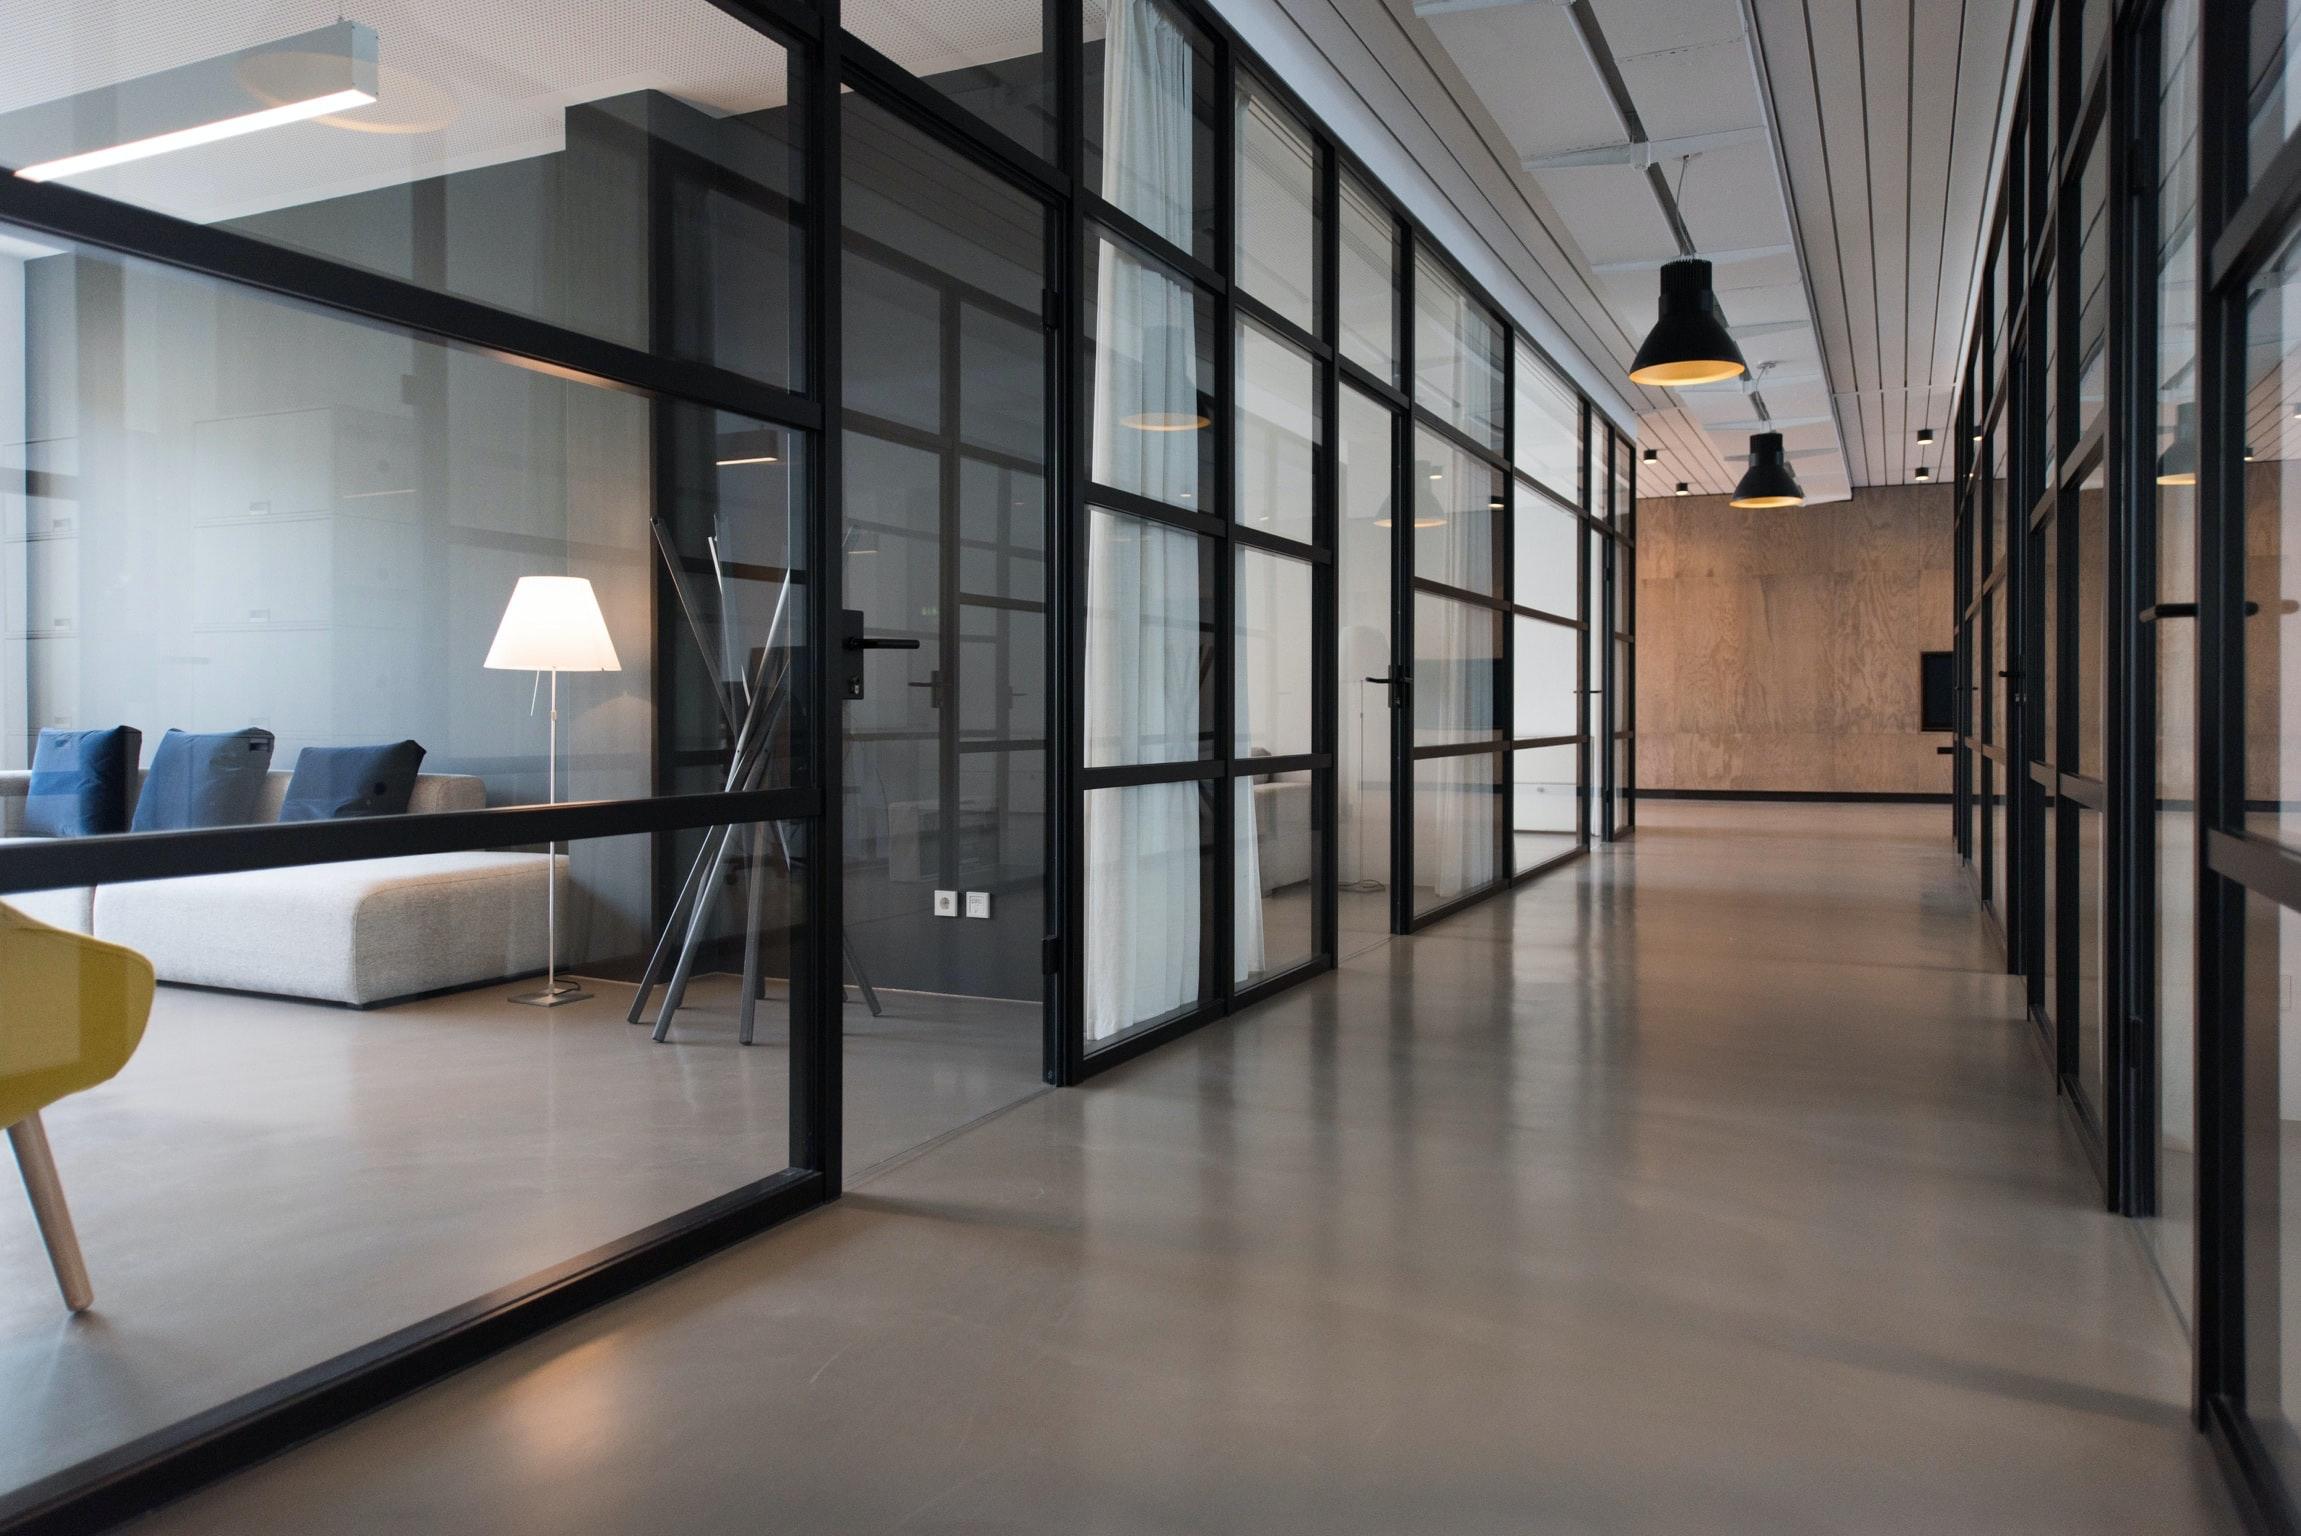 inversiones inmobiliarias - oficinas